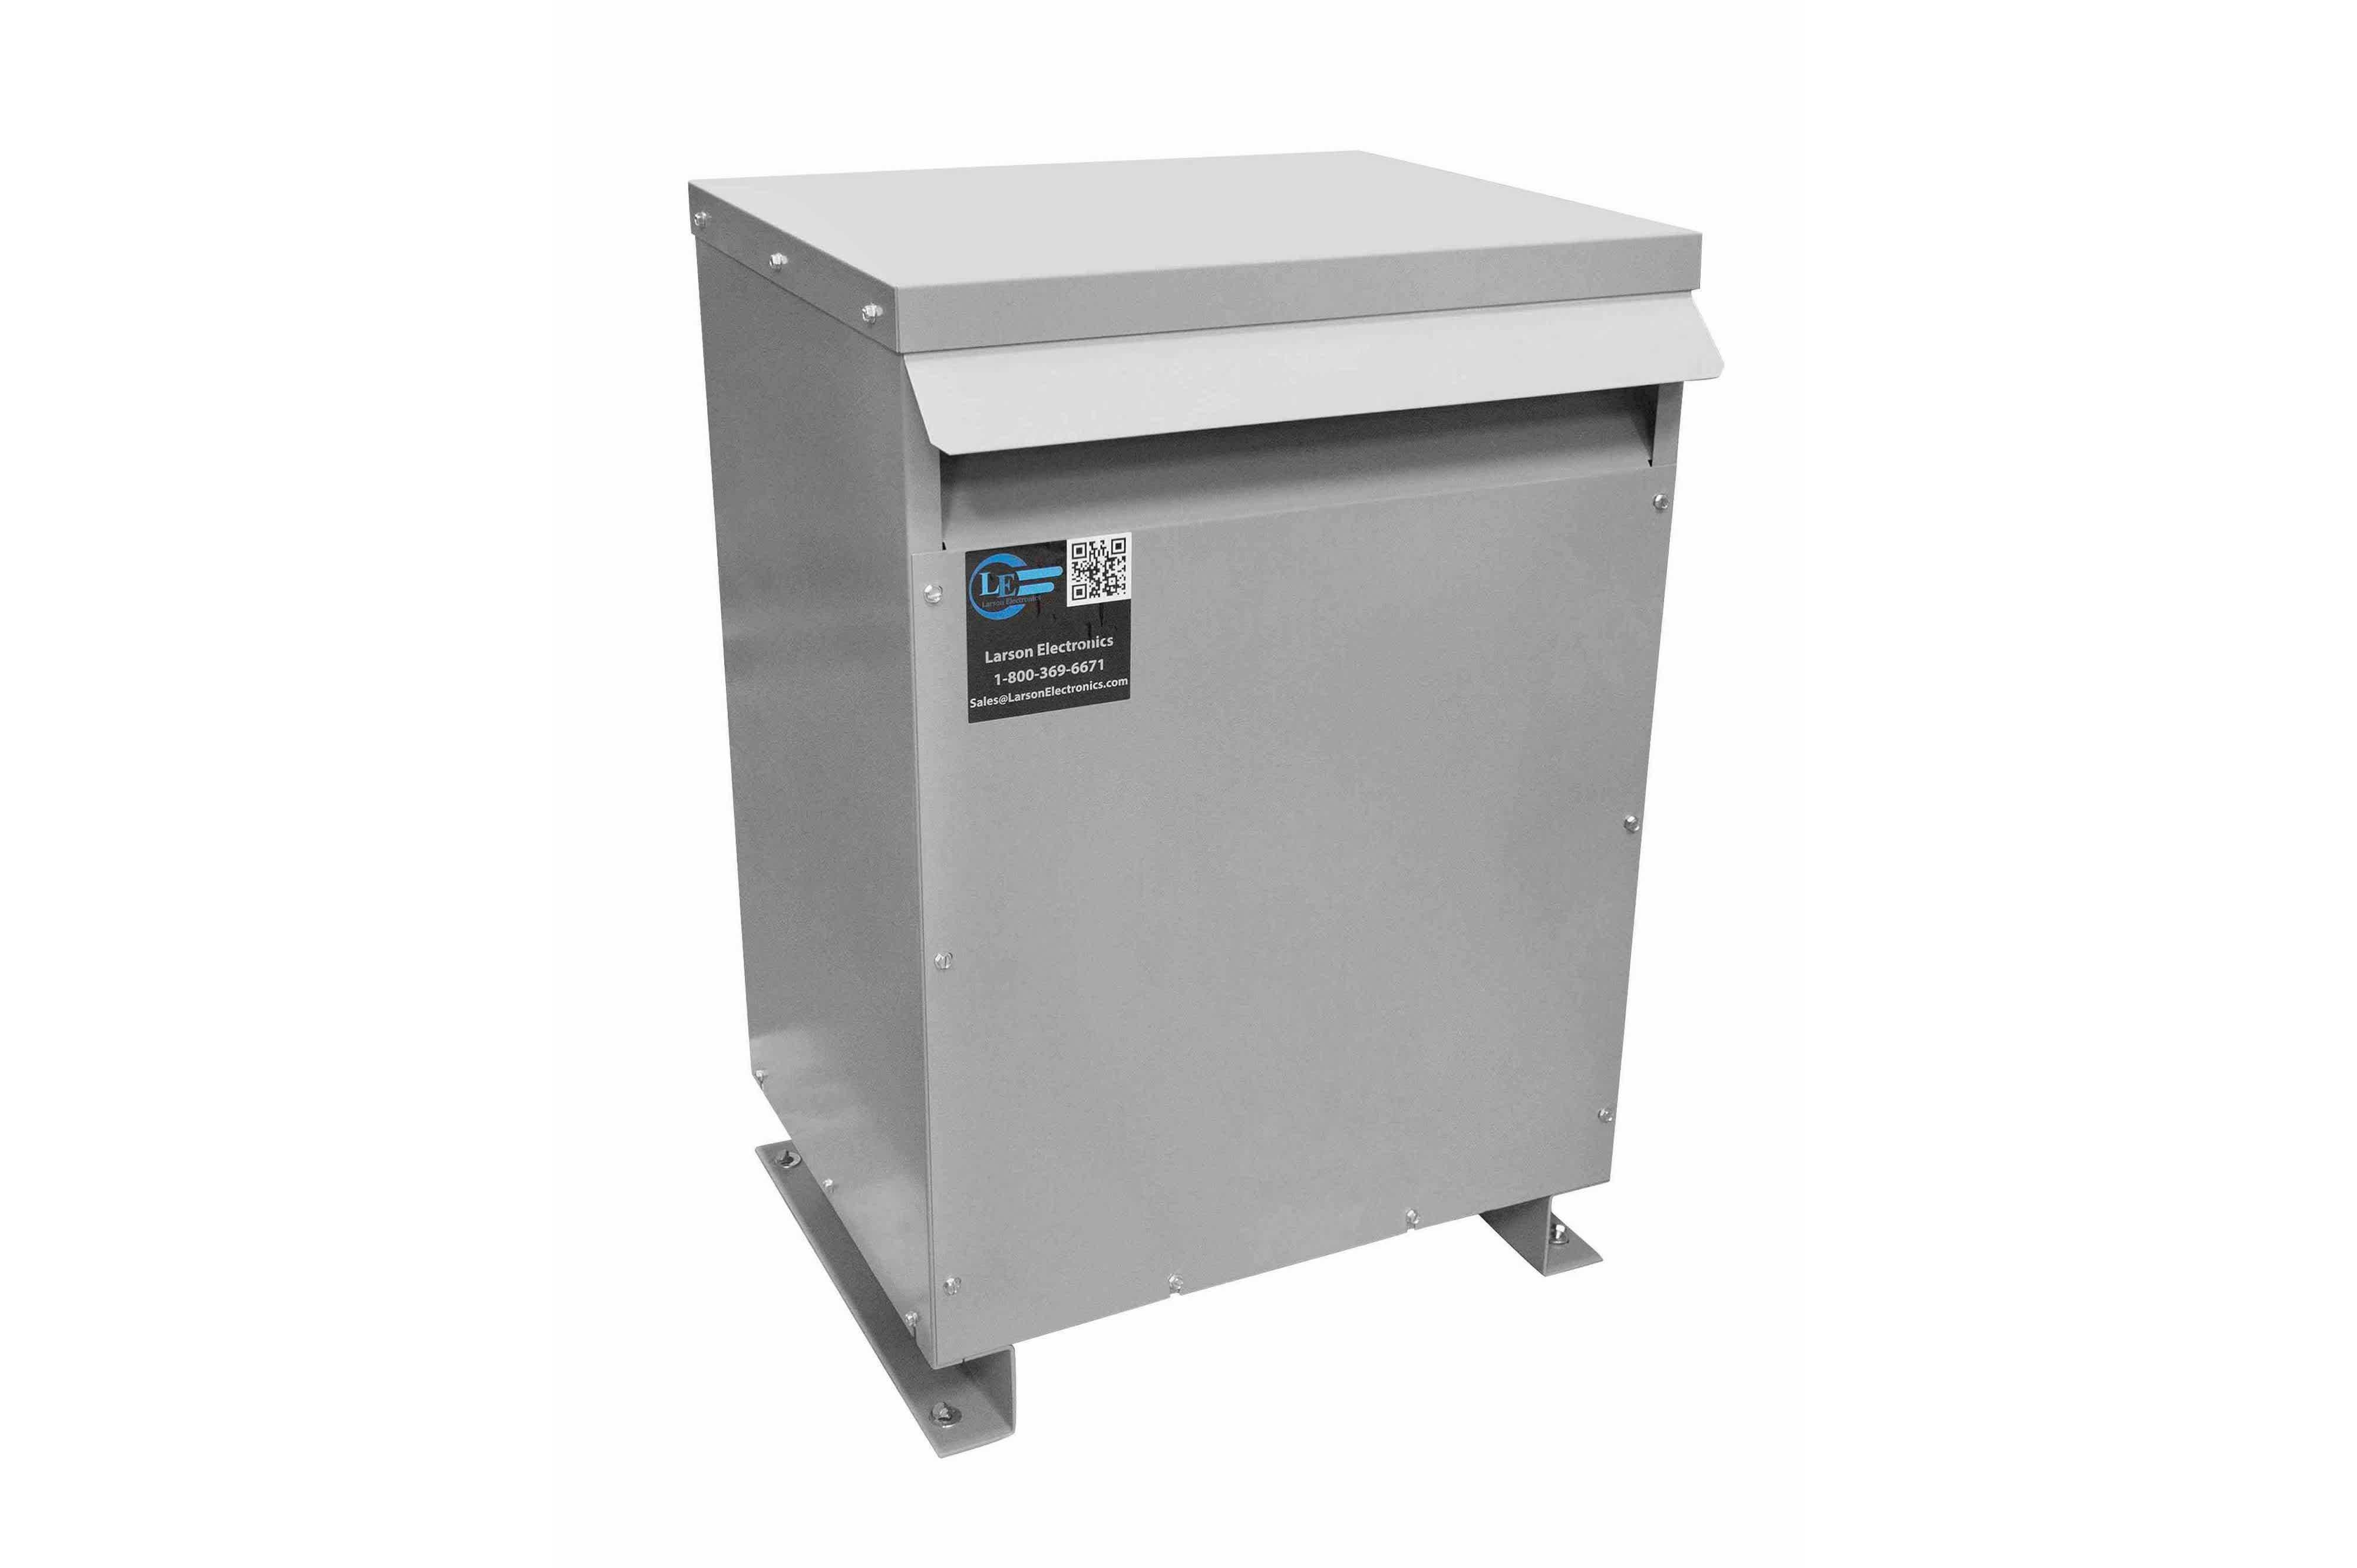 27 kVA 3PH Isolation Transformer, 240V Wye Primary, 380V Delta Secondary, N3R, Ventilated, 60 Hz